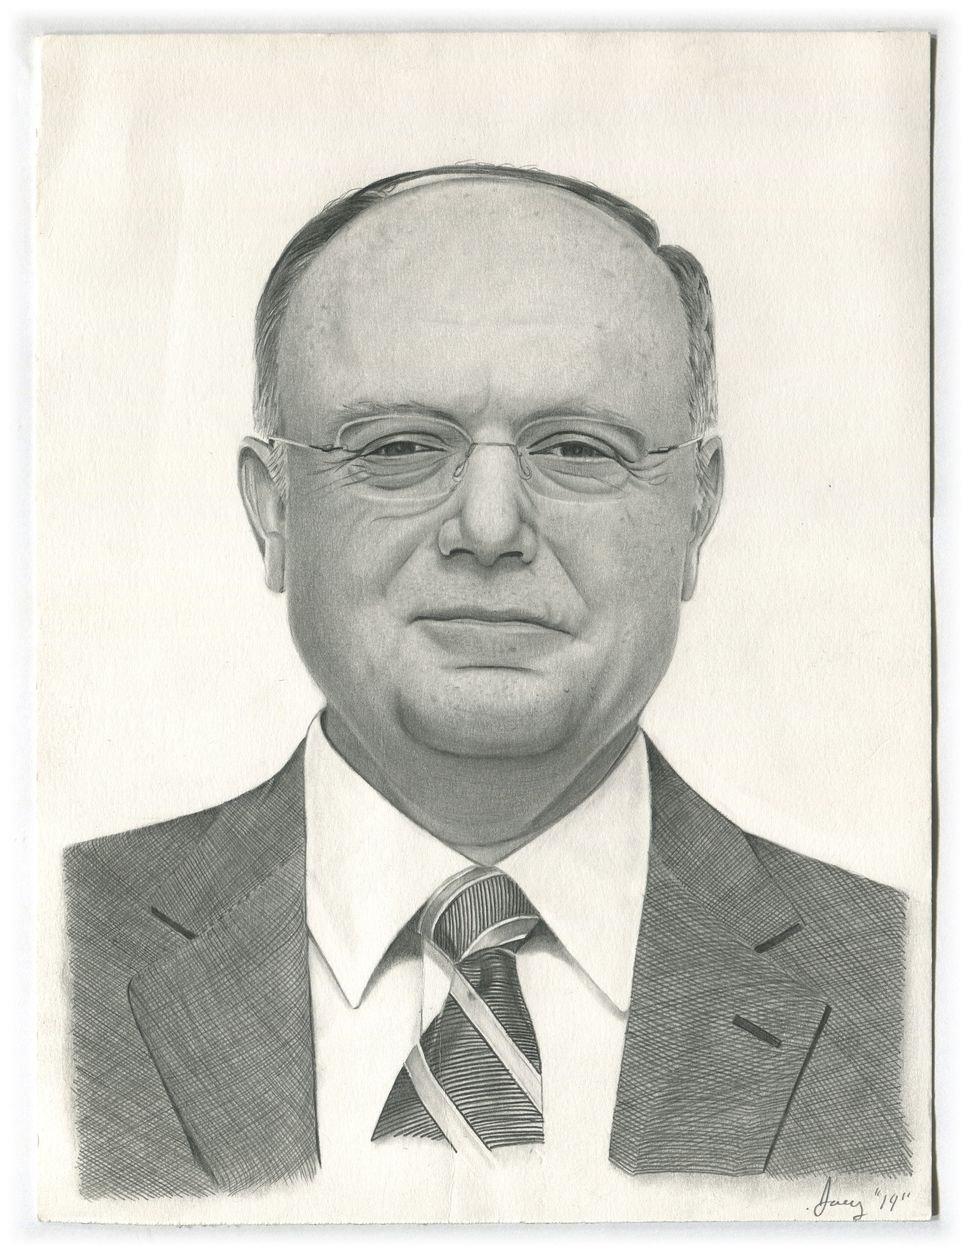 Joseph Sharrow (Prison ID#D-3-102) drewCEO of PfizerIan Read. Read is accused ofAIDS profiteering, br